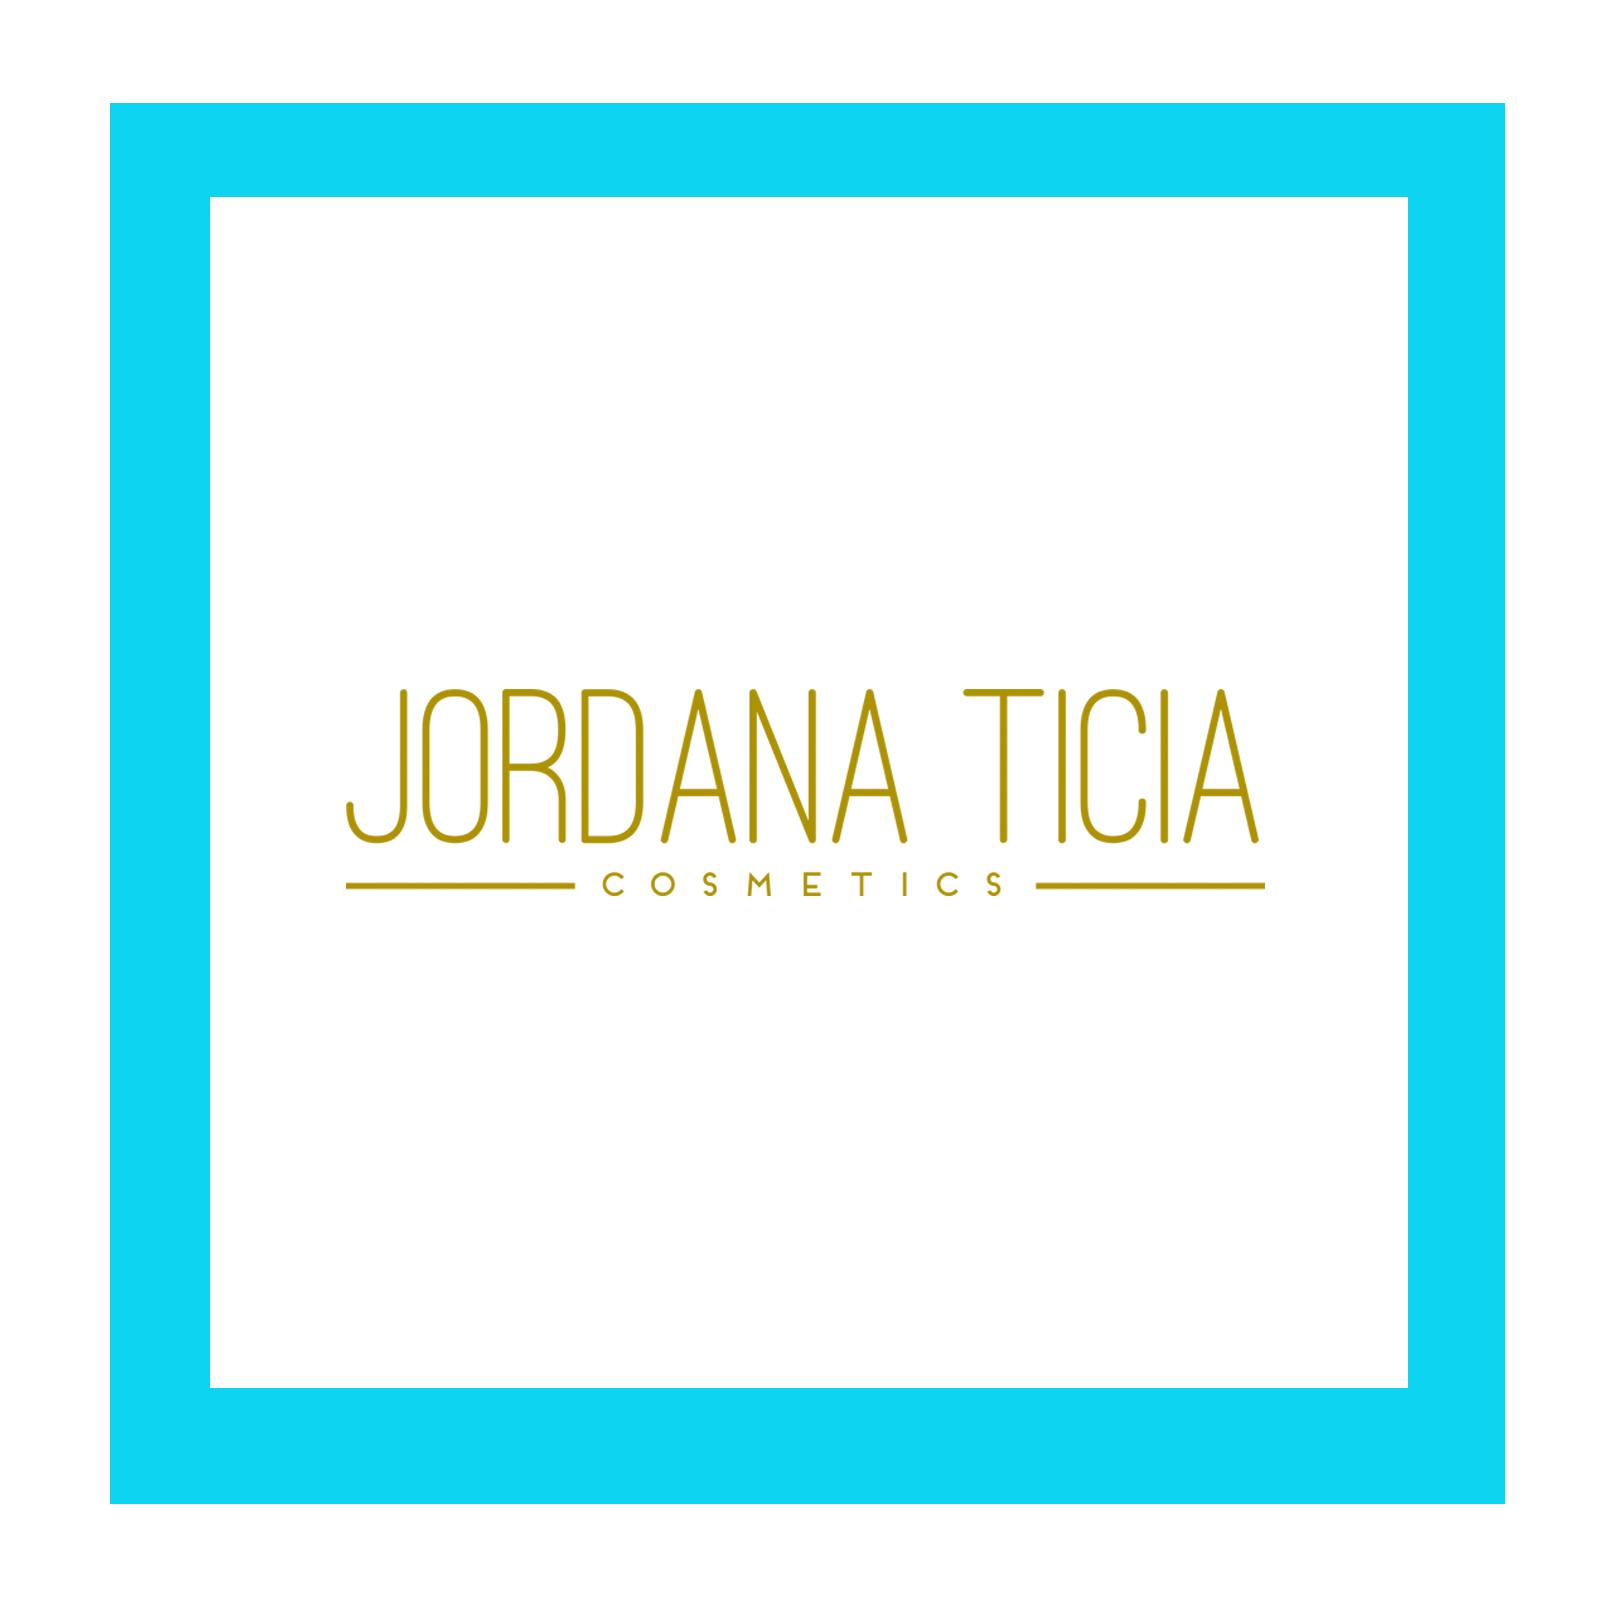 Jordana.jpg